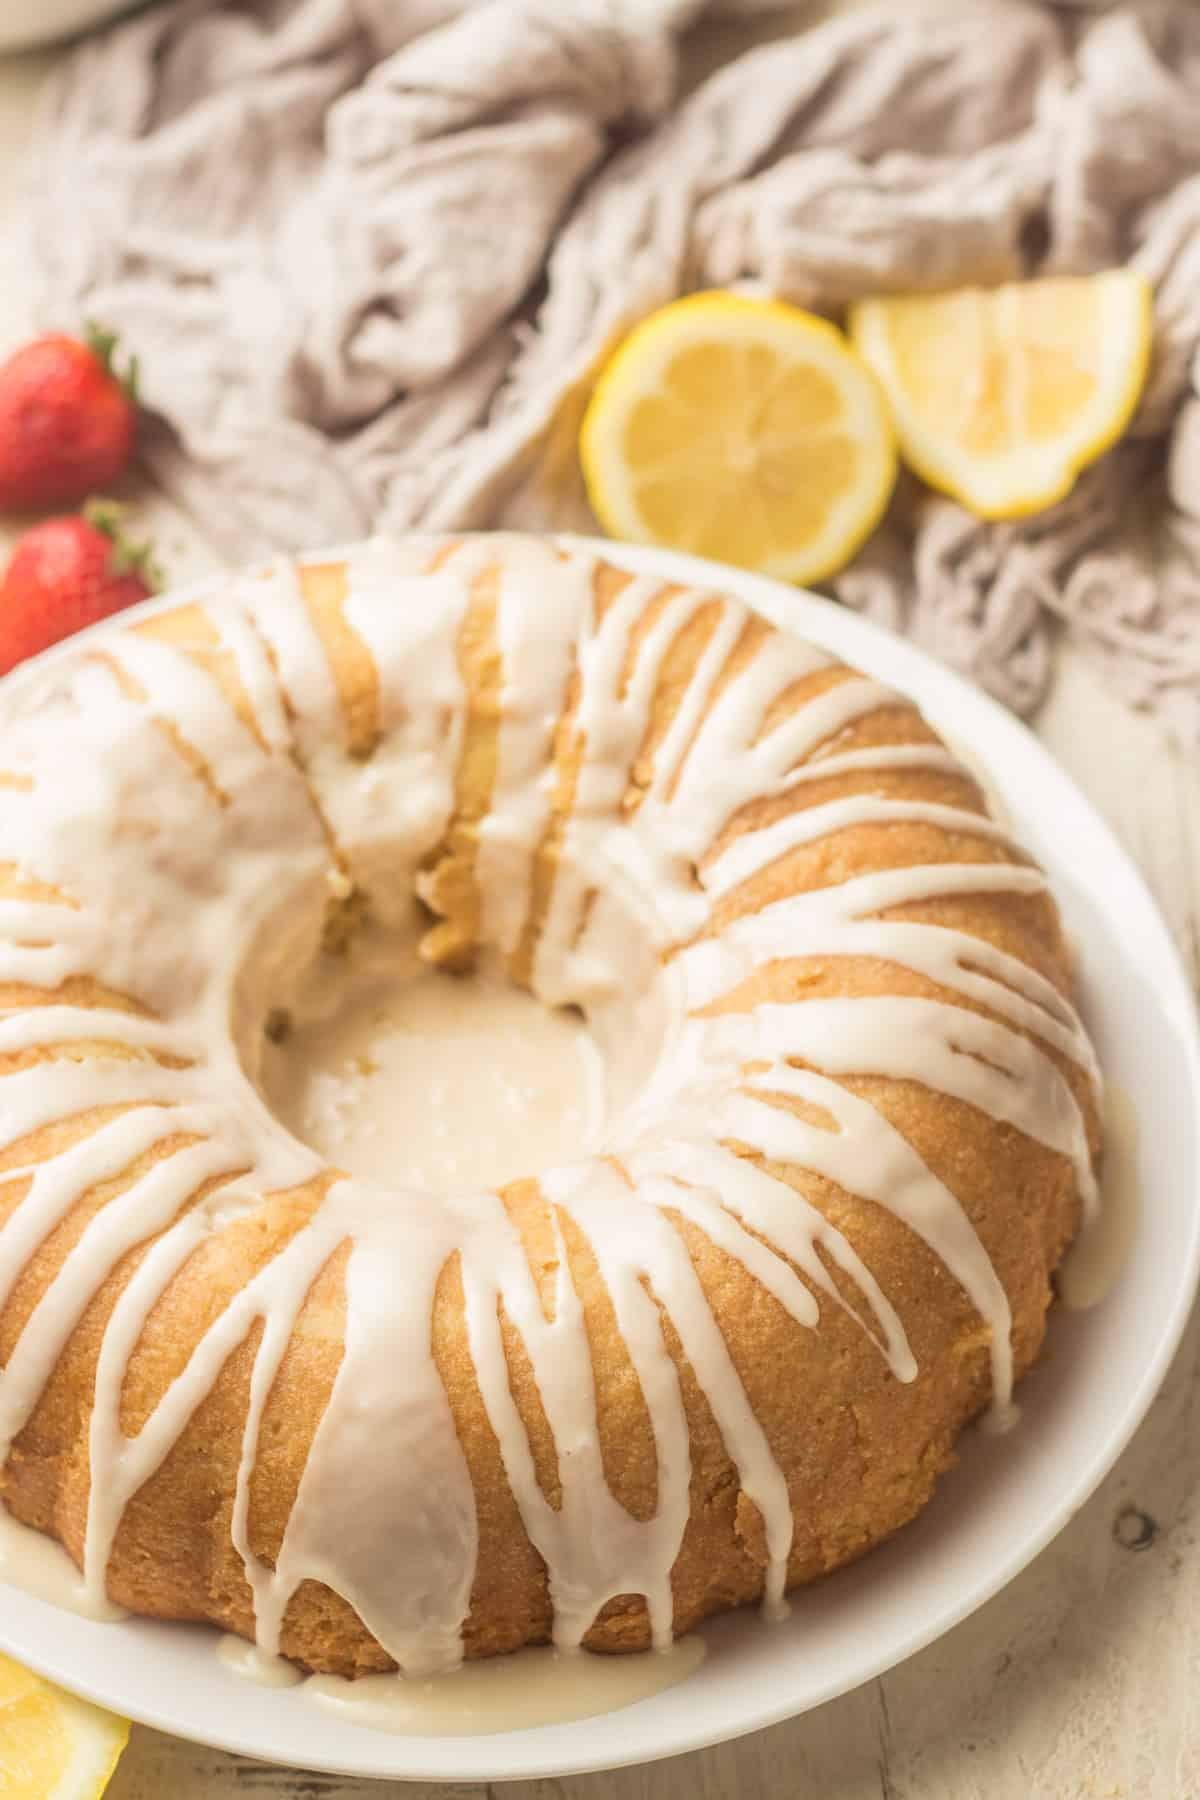 Vegan Lemon Bundt Cake on a dish with Napkin, Strawberries, and Lemon Slices in the Background